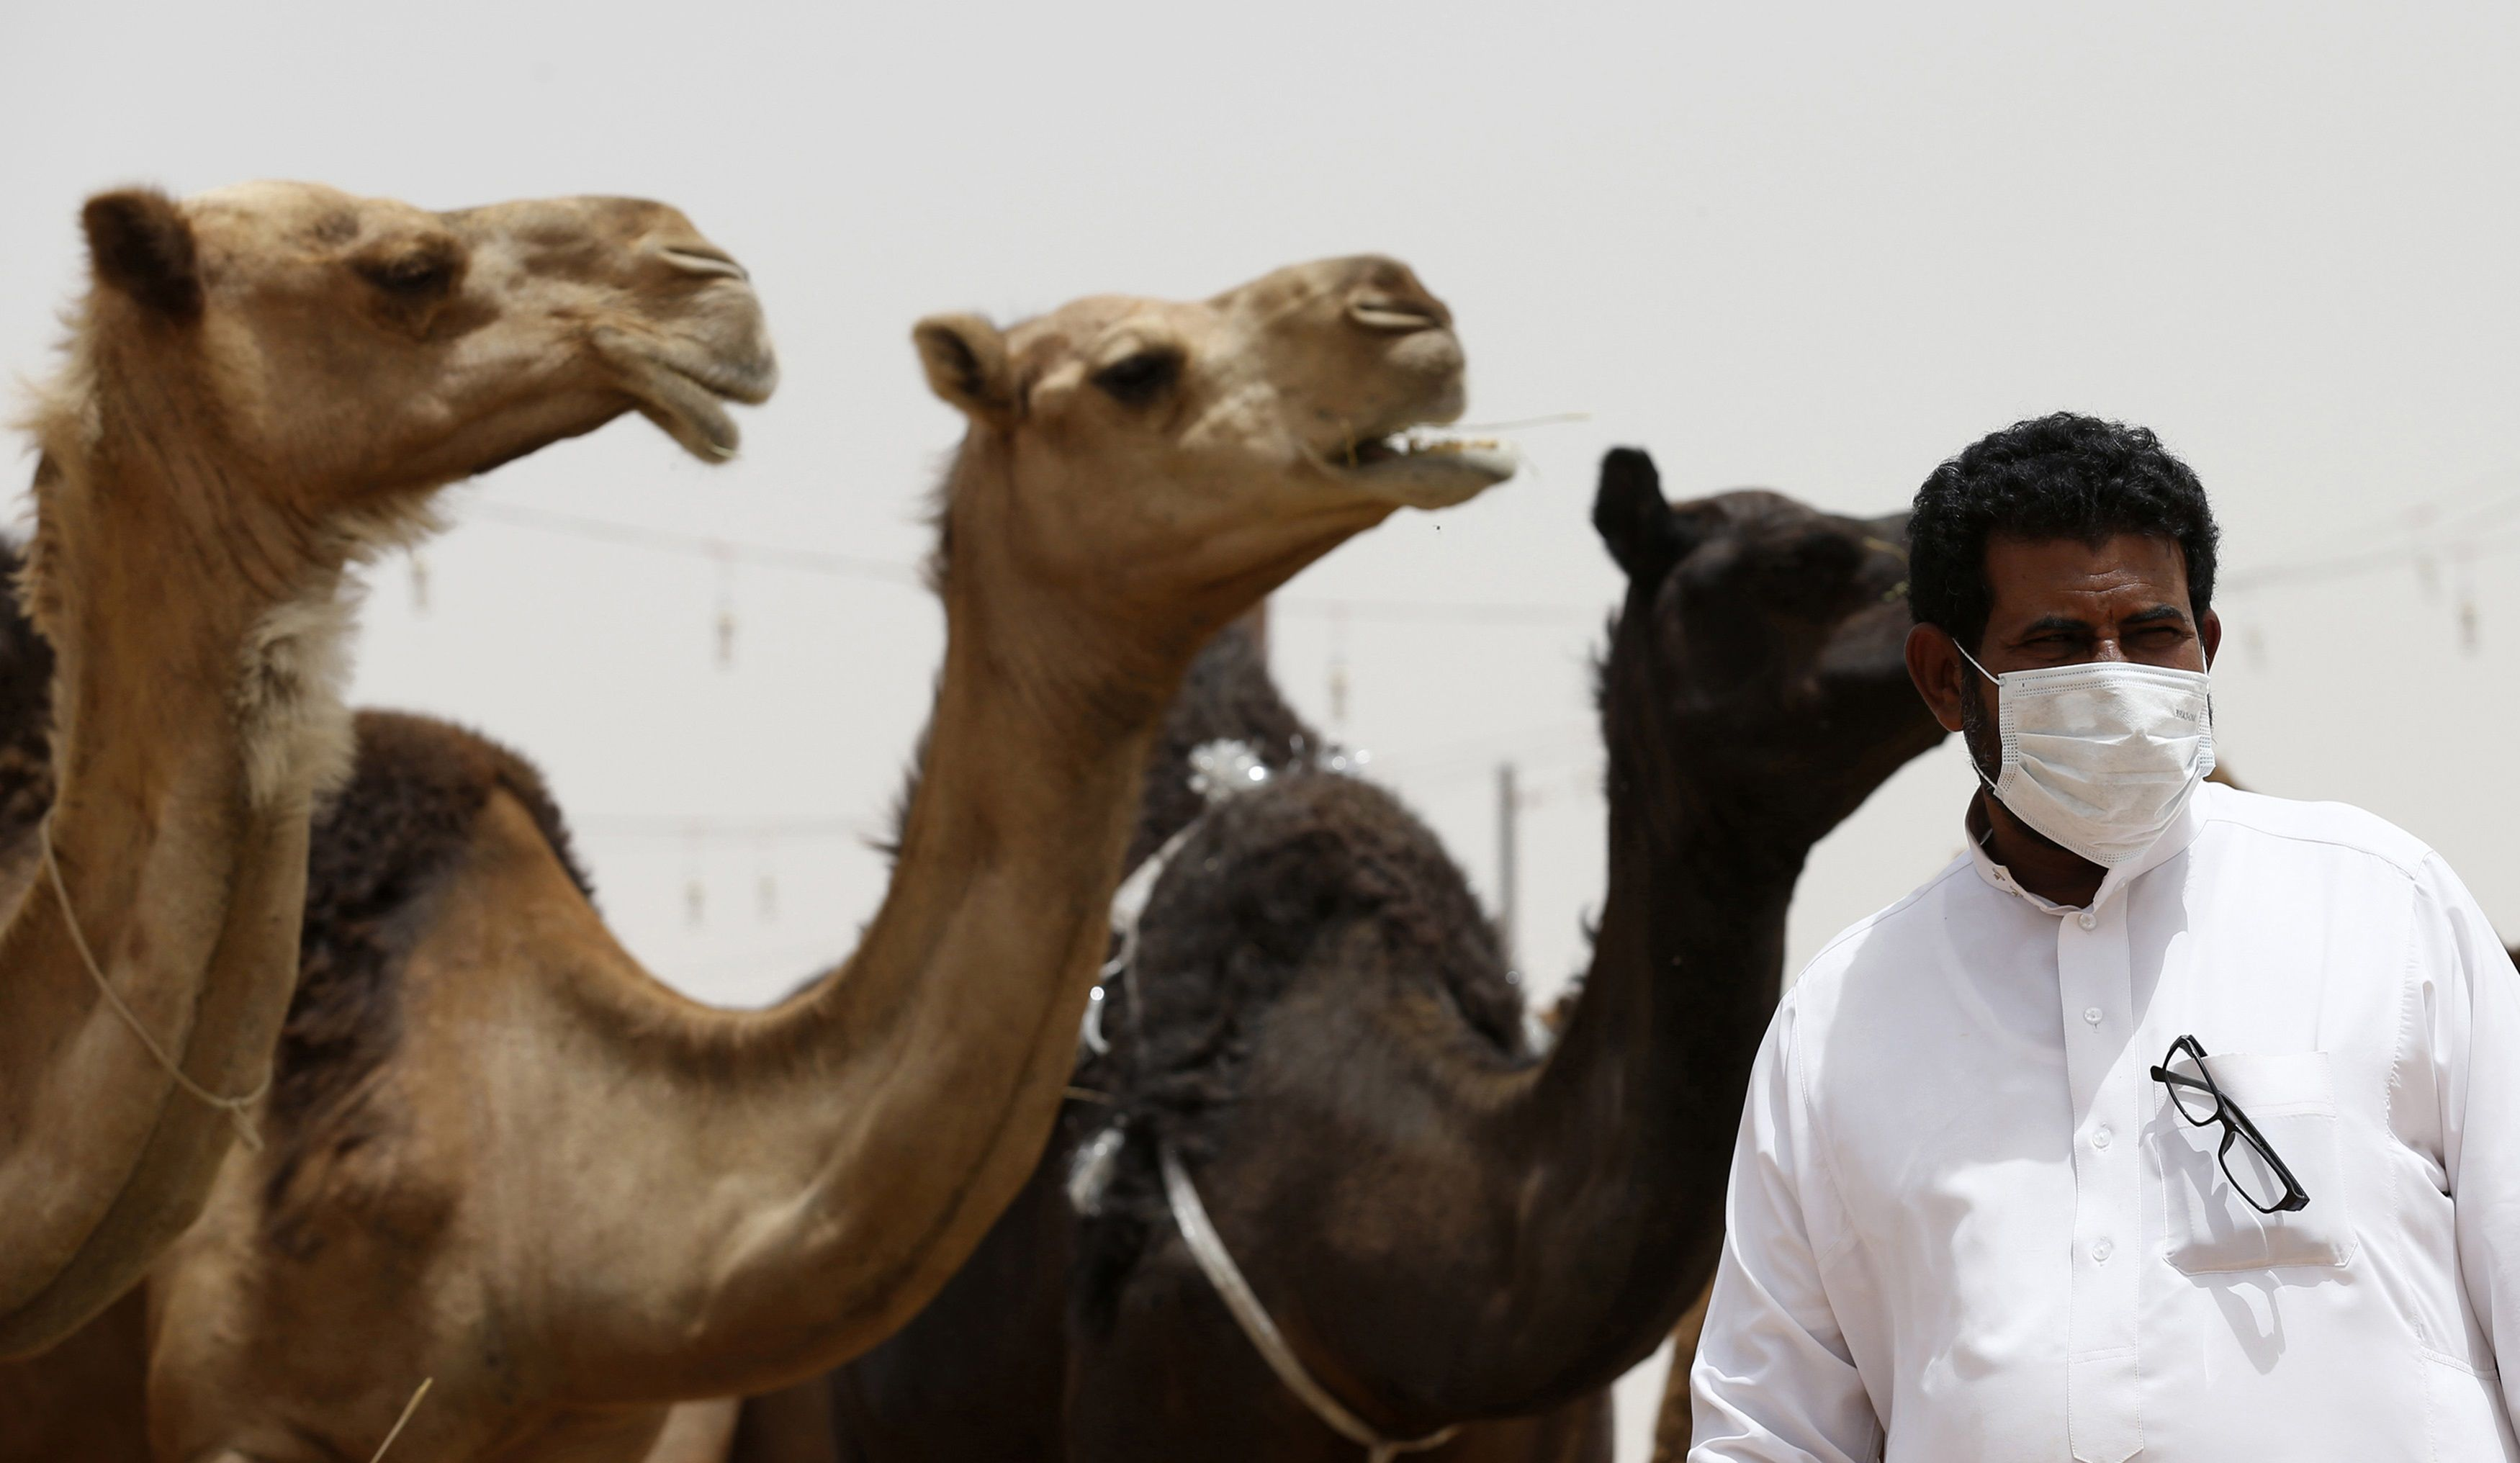 CamelMers